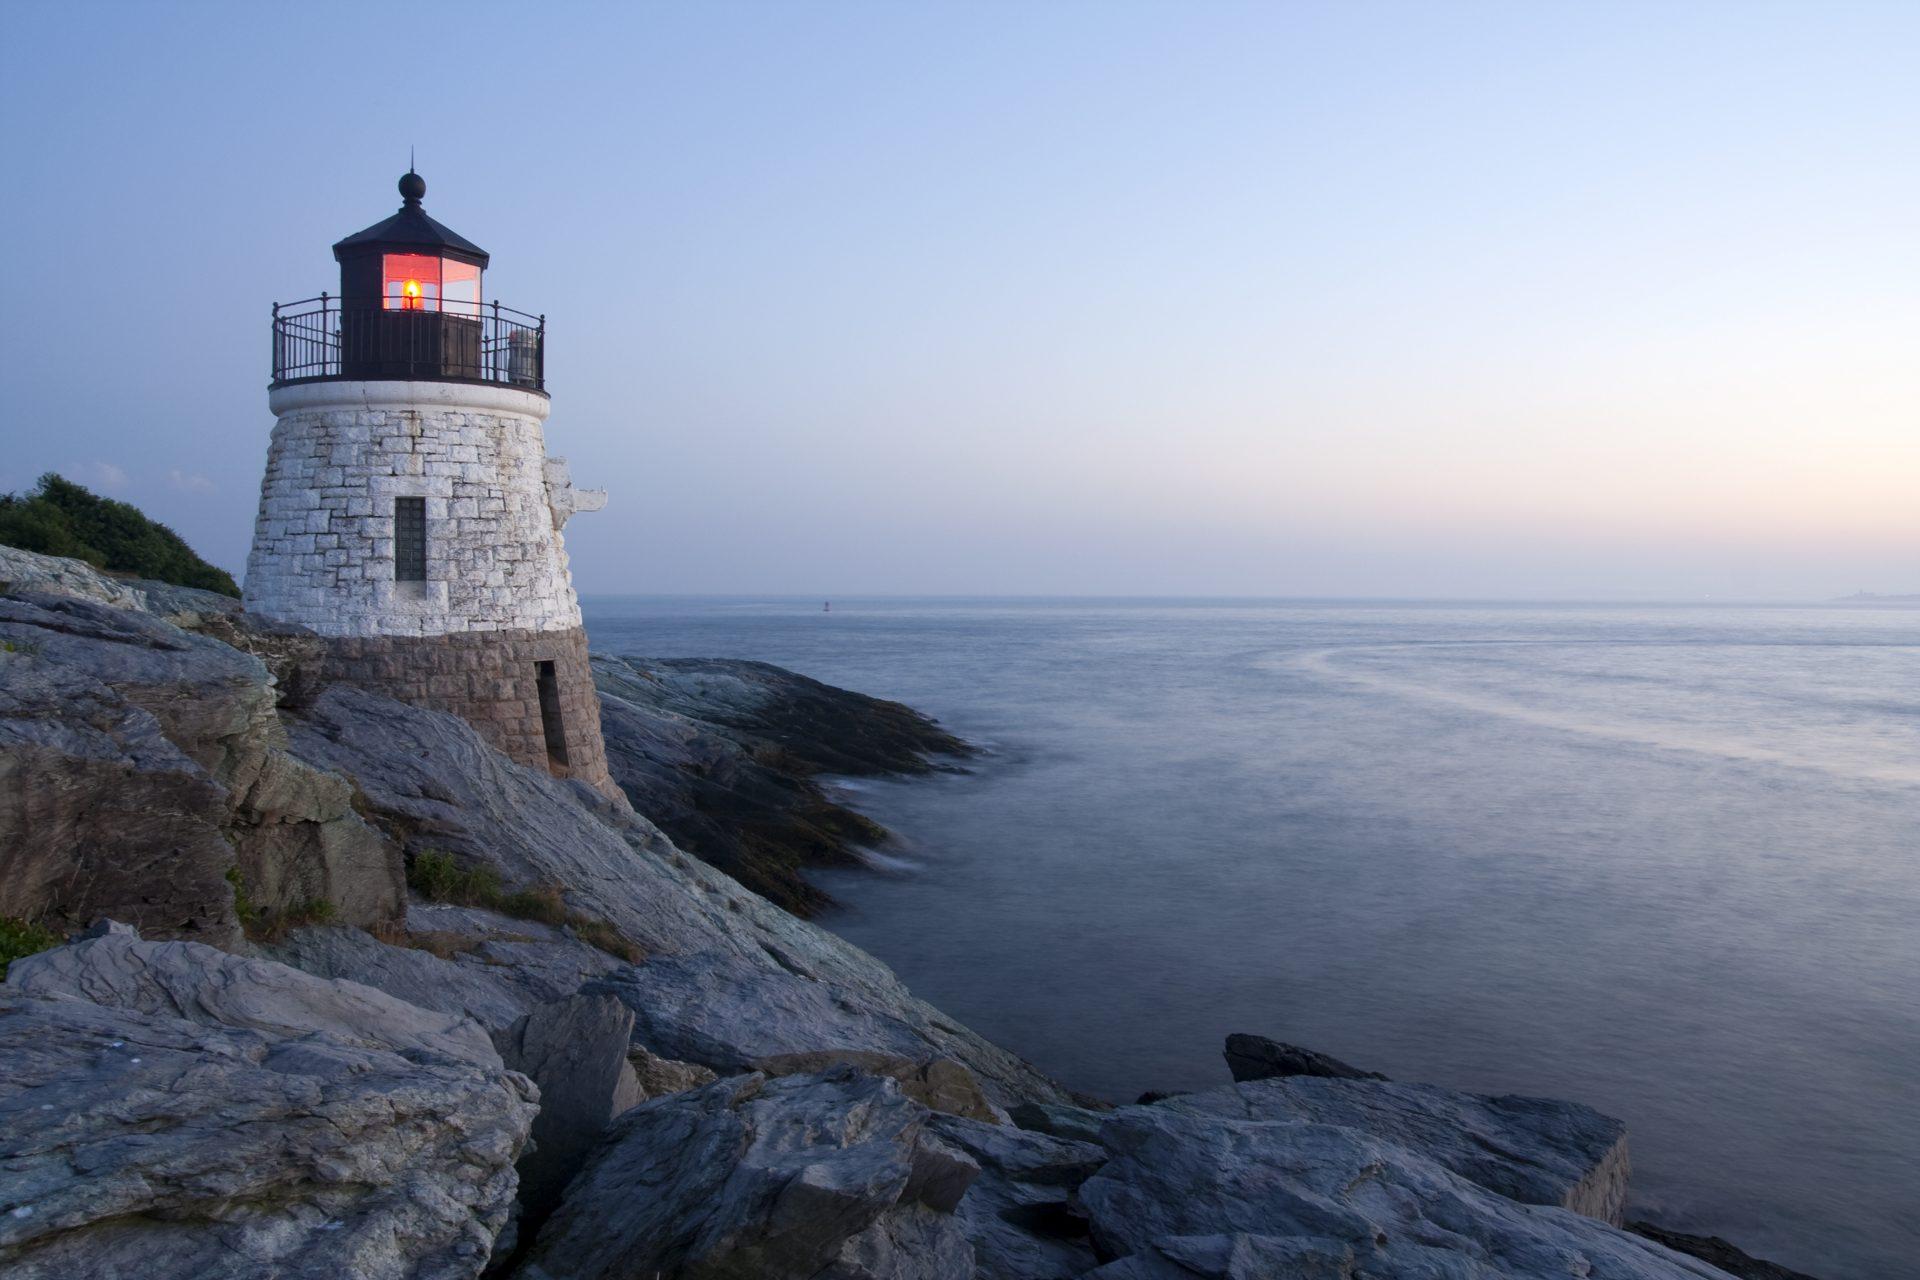 Castle Hill Lighthouse in Newport, Rhode Island